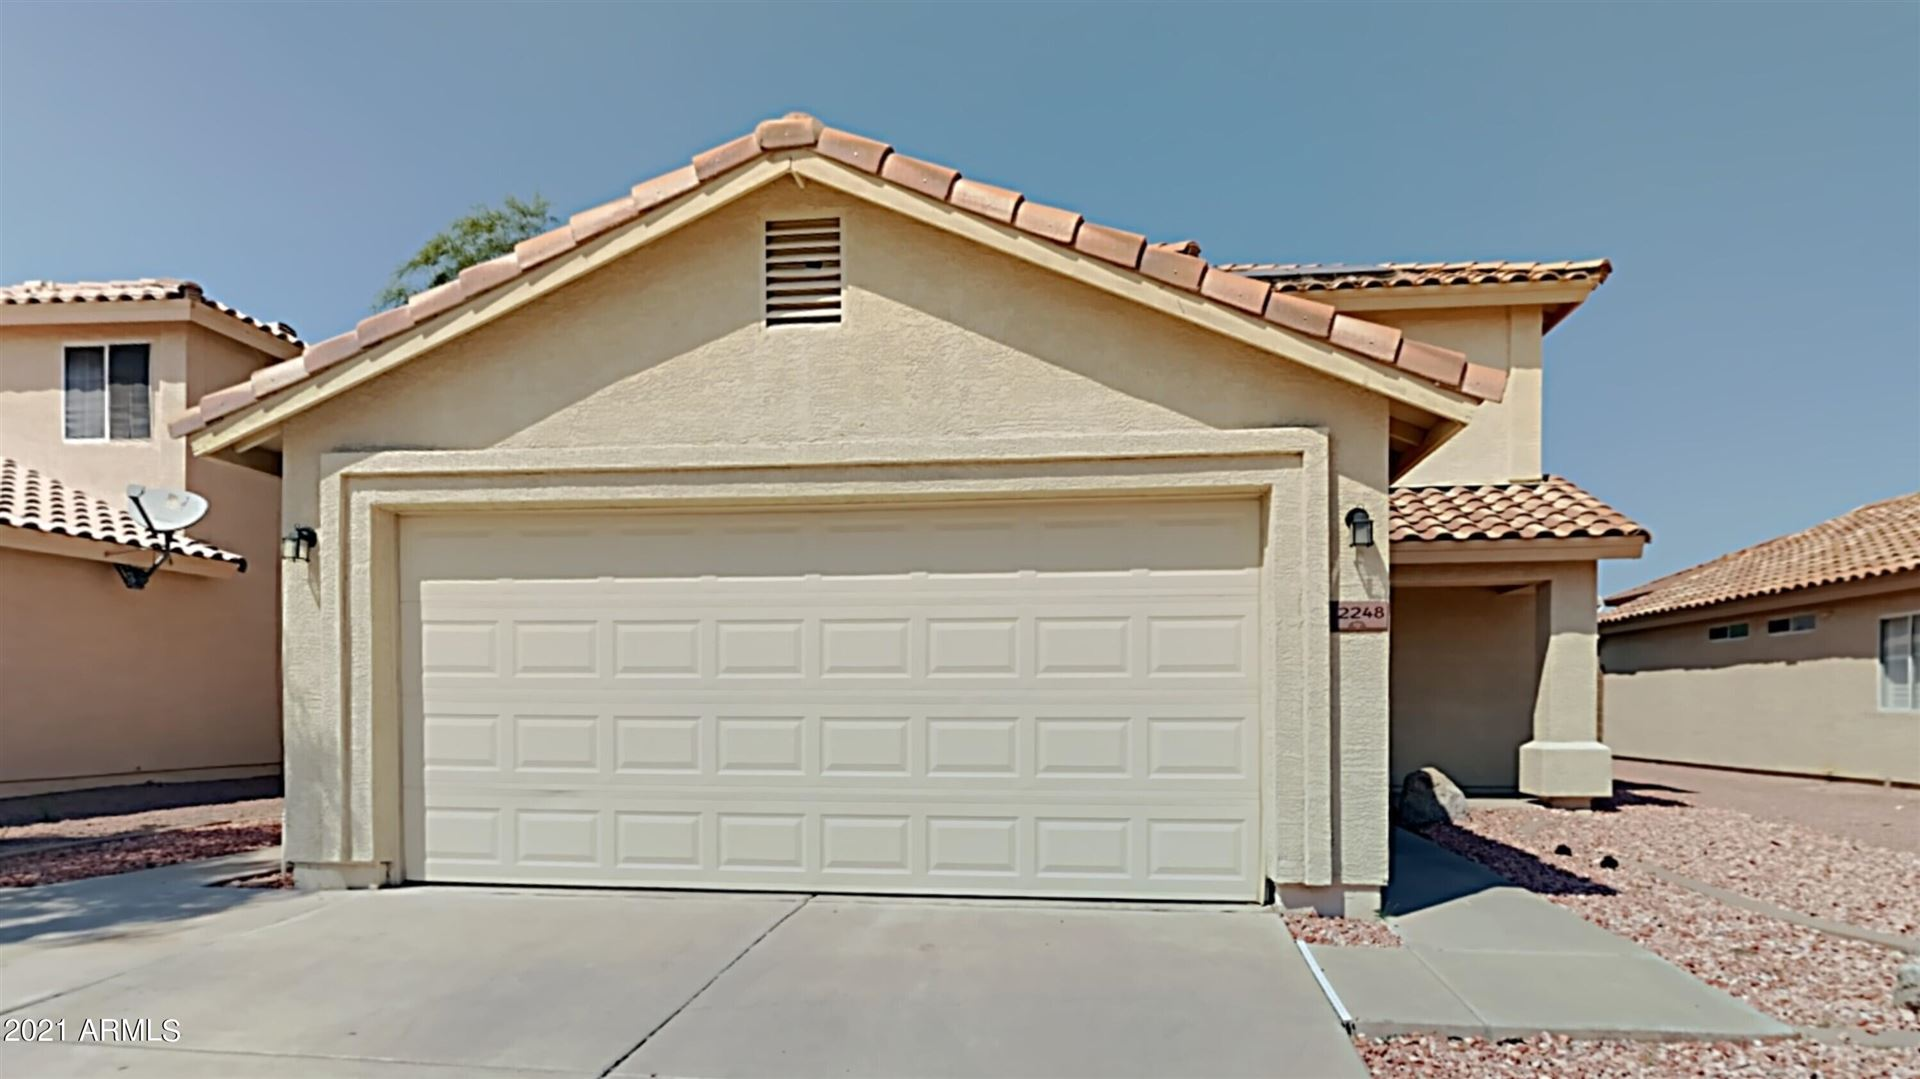 Photo of 12248 W COLUMBINE Drive, El Mirage, AZ 85335 (MLS # 6293639)